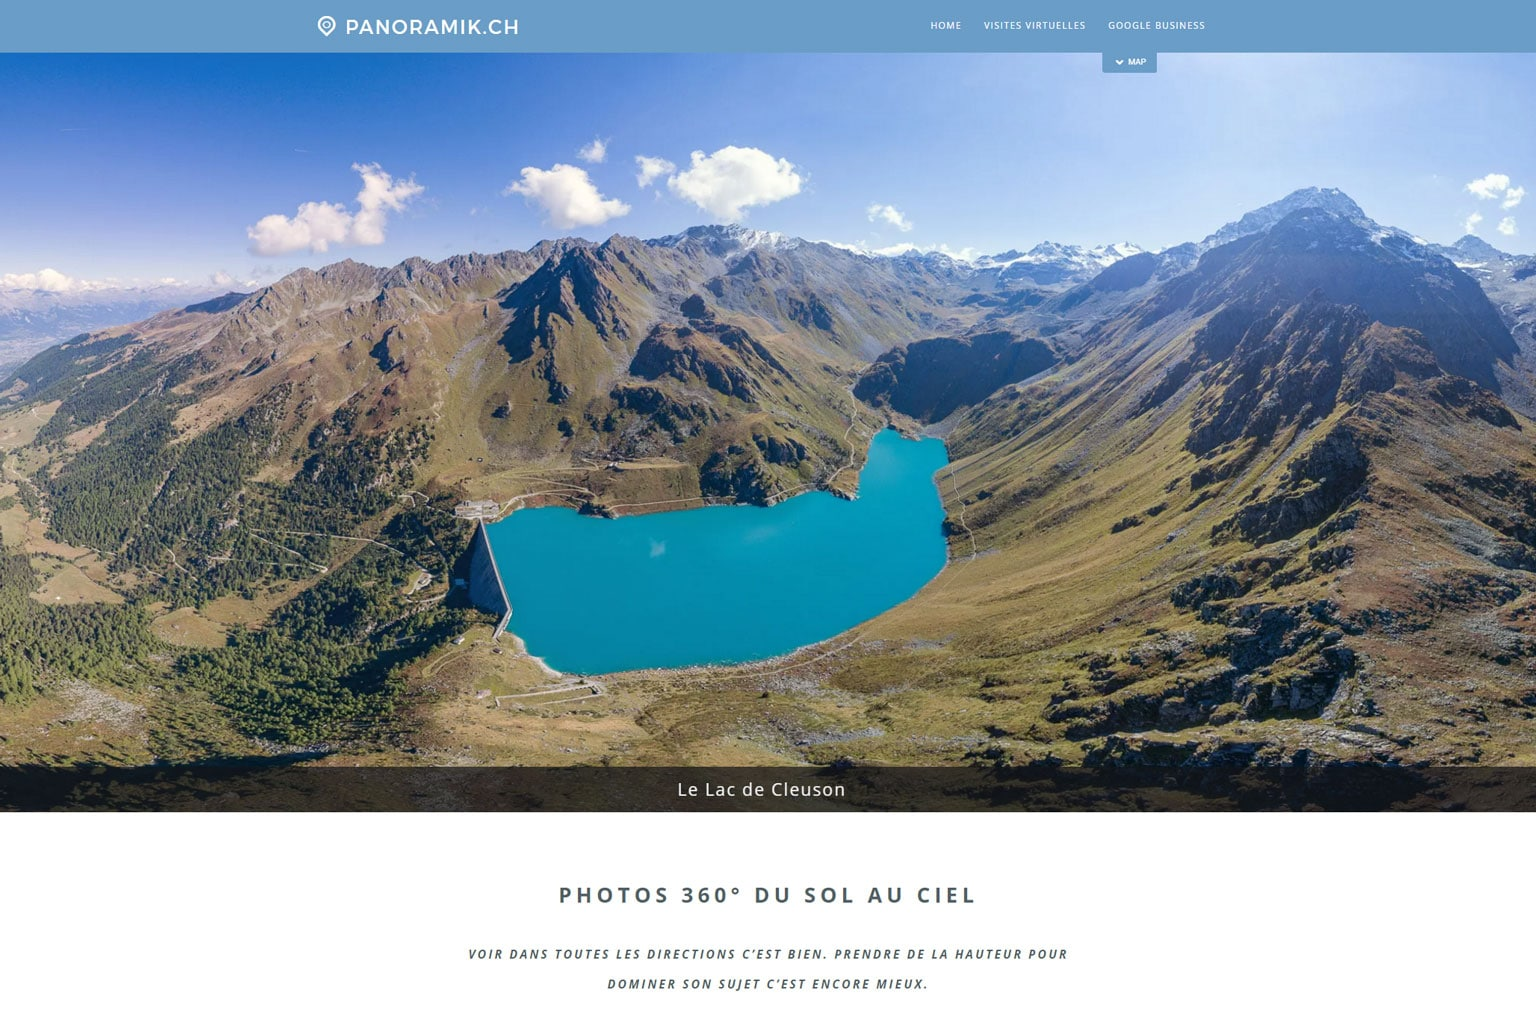 panoramik.ch